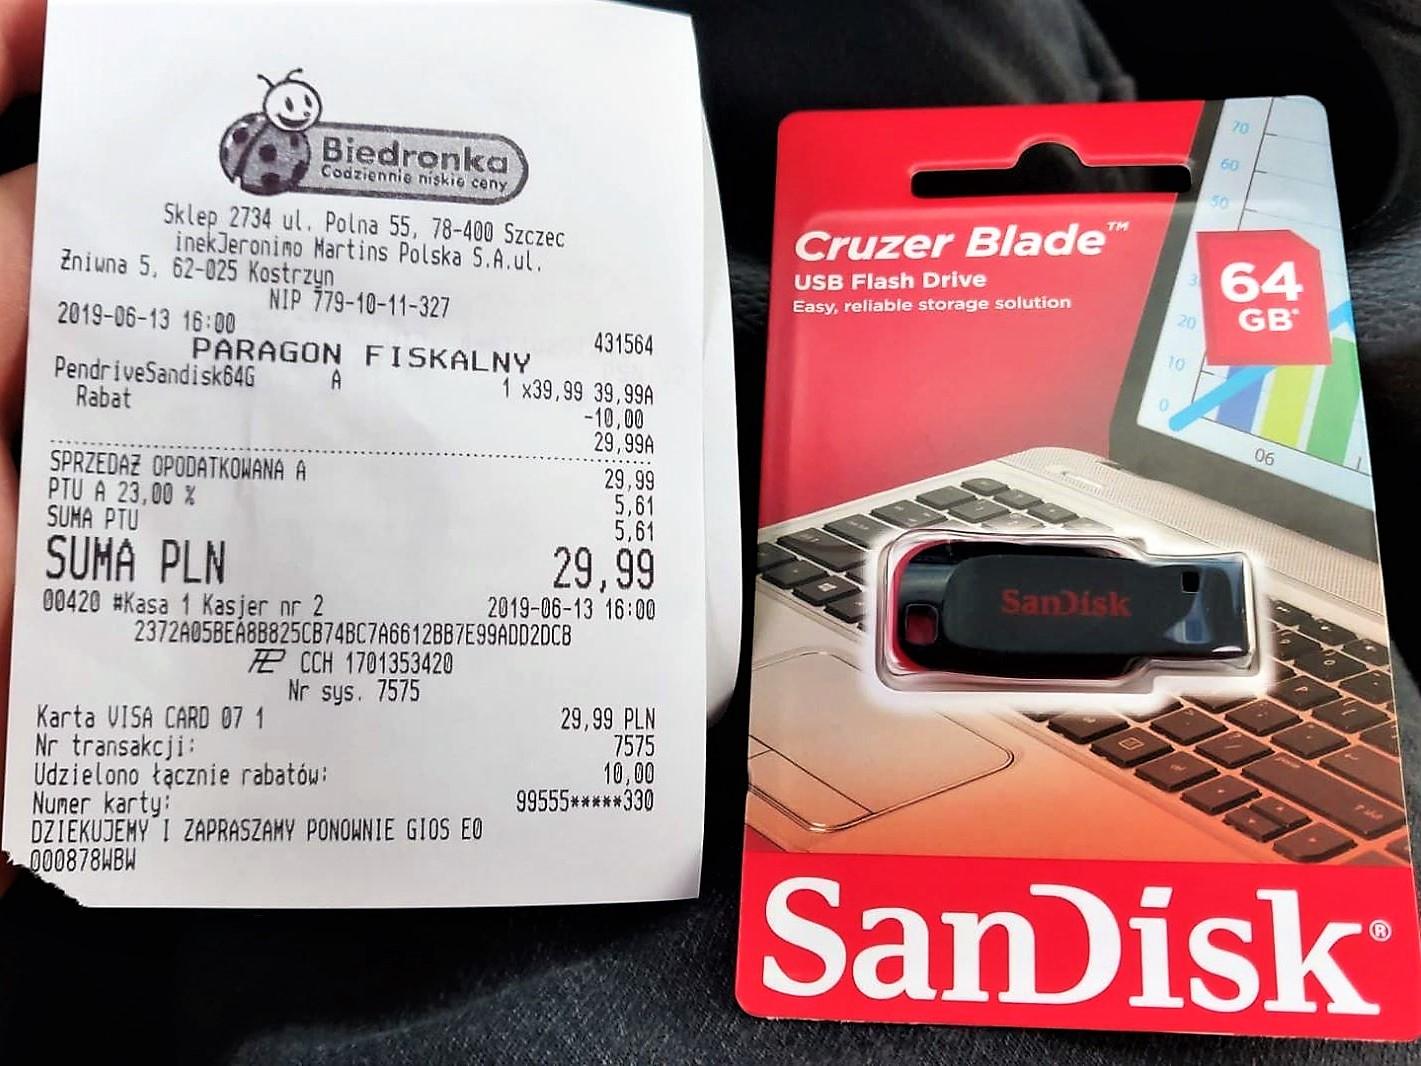 [Biedronka] SanDisk Cruzer Blade - 64GB Pendrive USB 2.0 - Polecany do PlayStation Classic